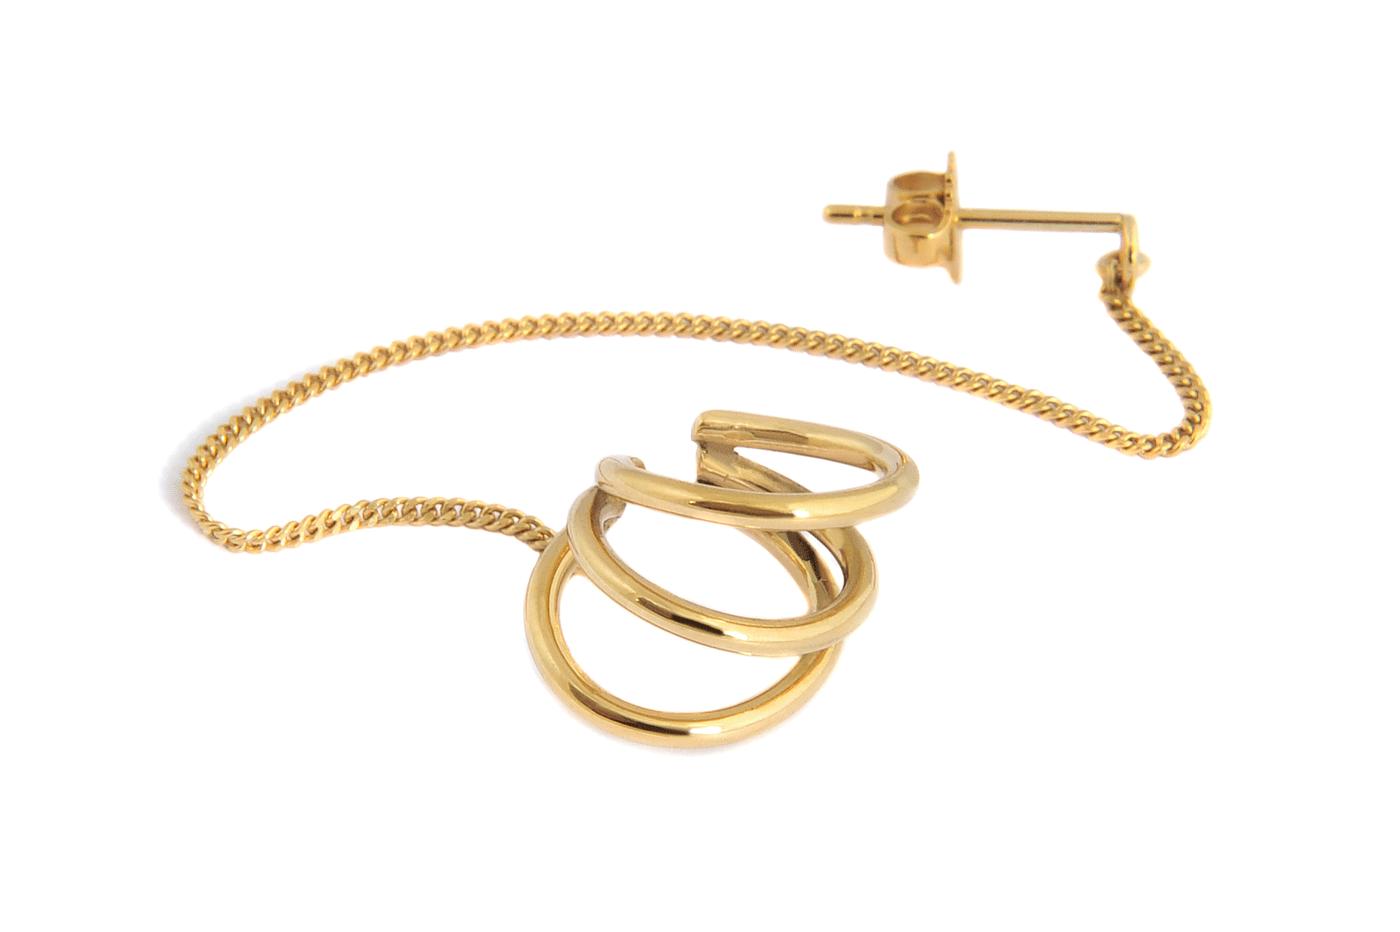 Adeline Cacheux Jewelry Design bijou oreille